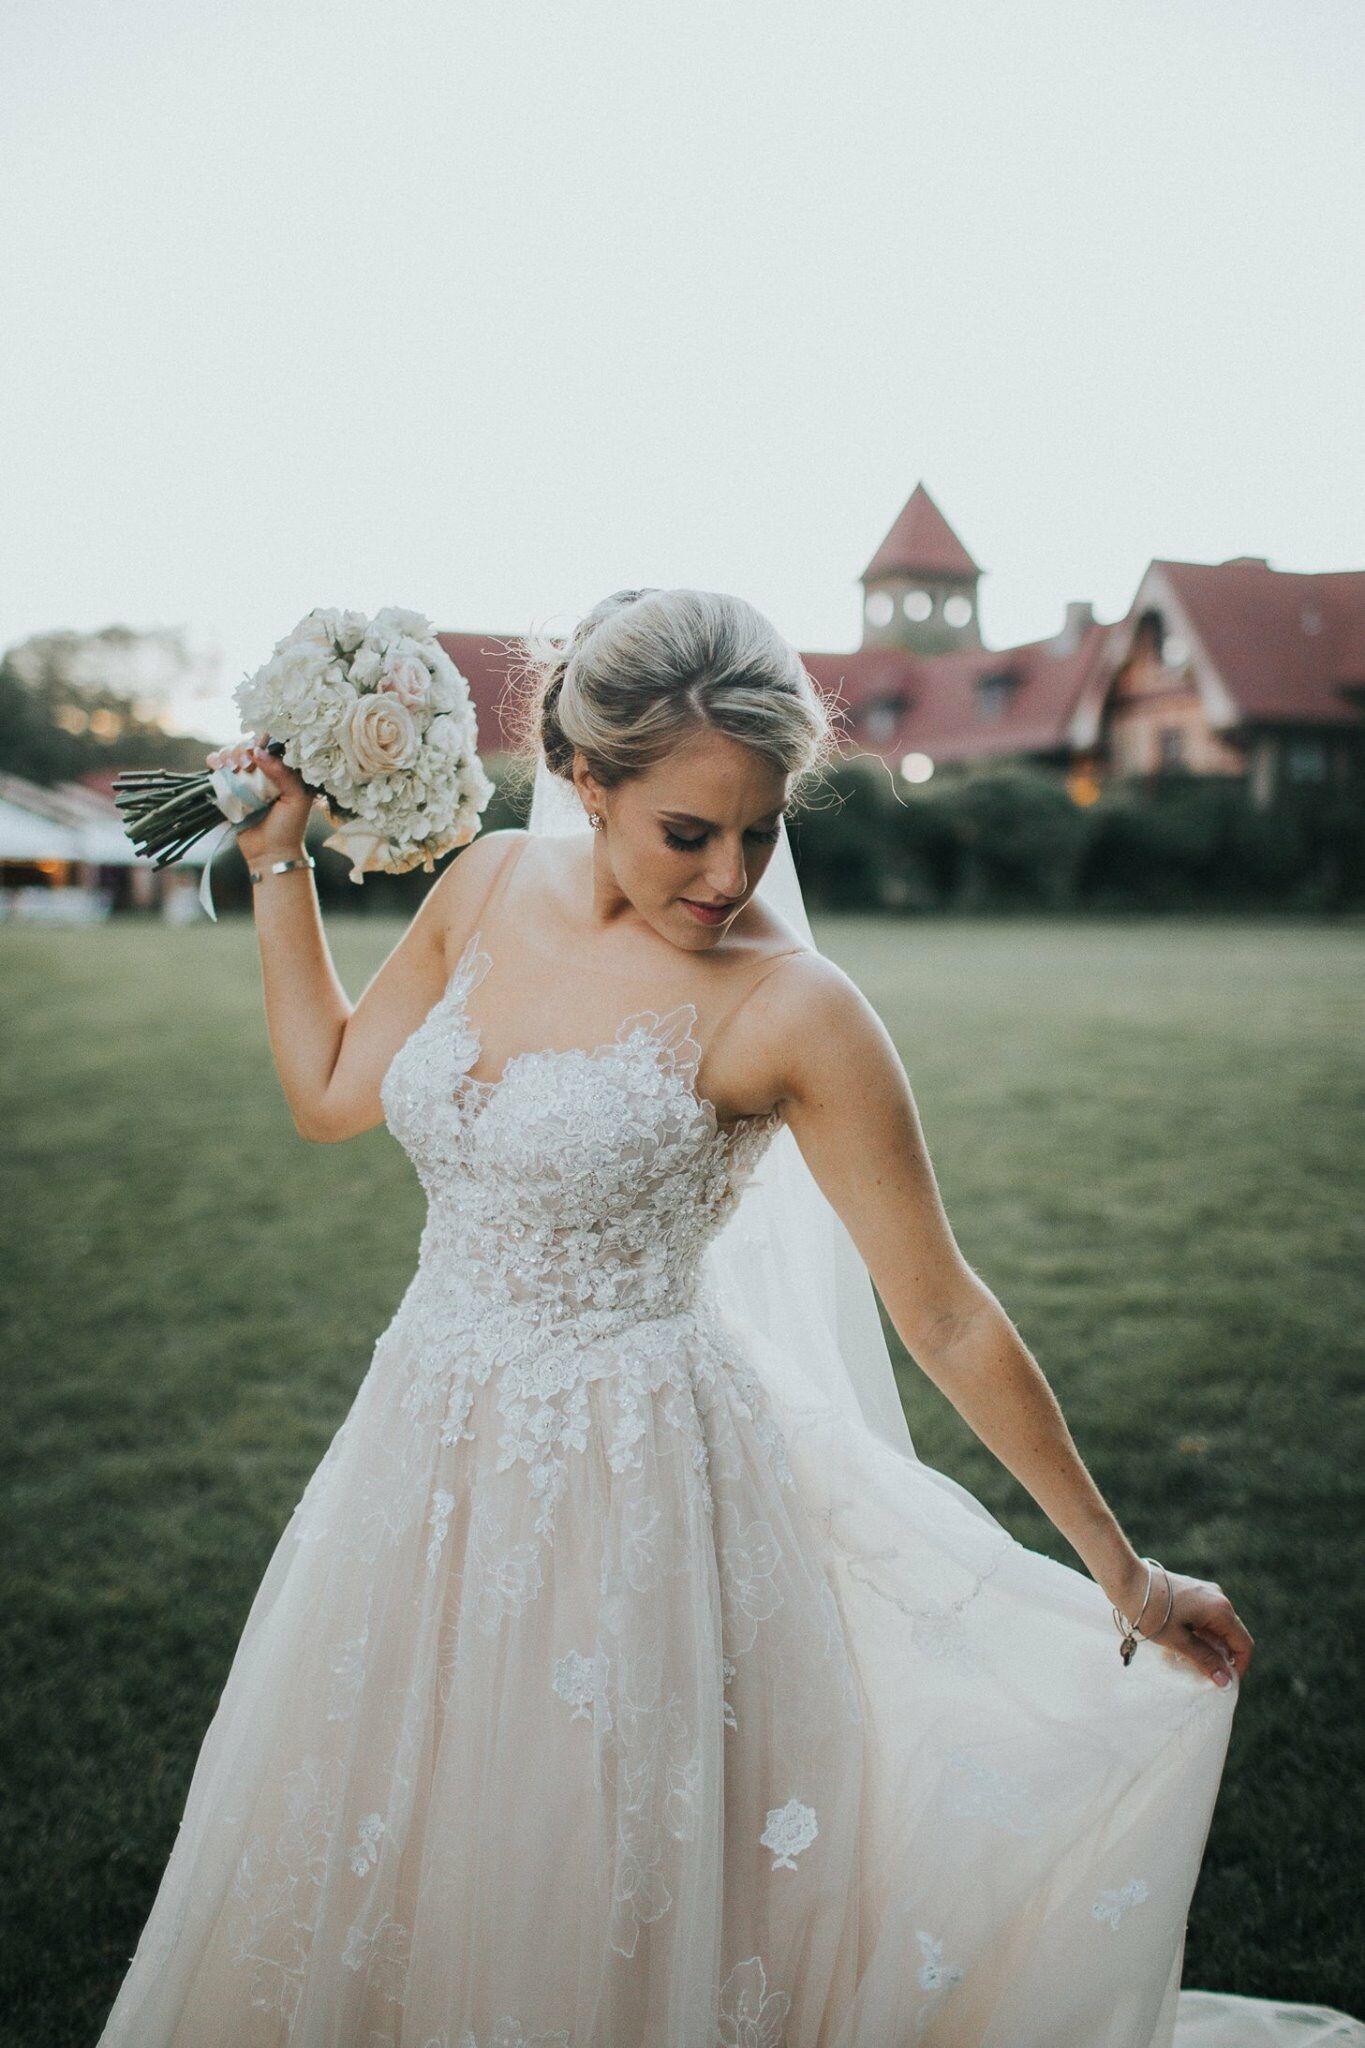 Bliss Bridal - Cheshire, CT